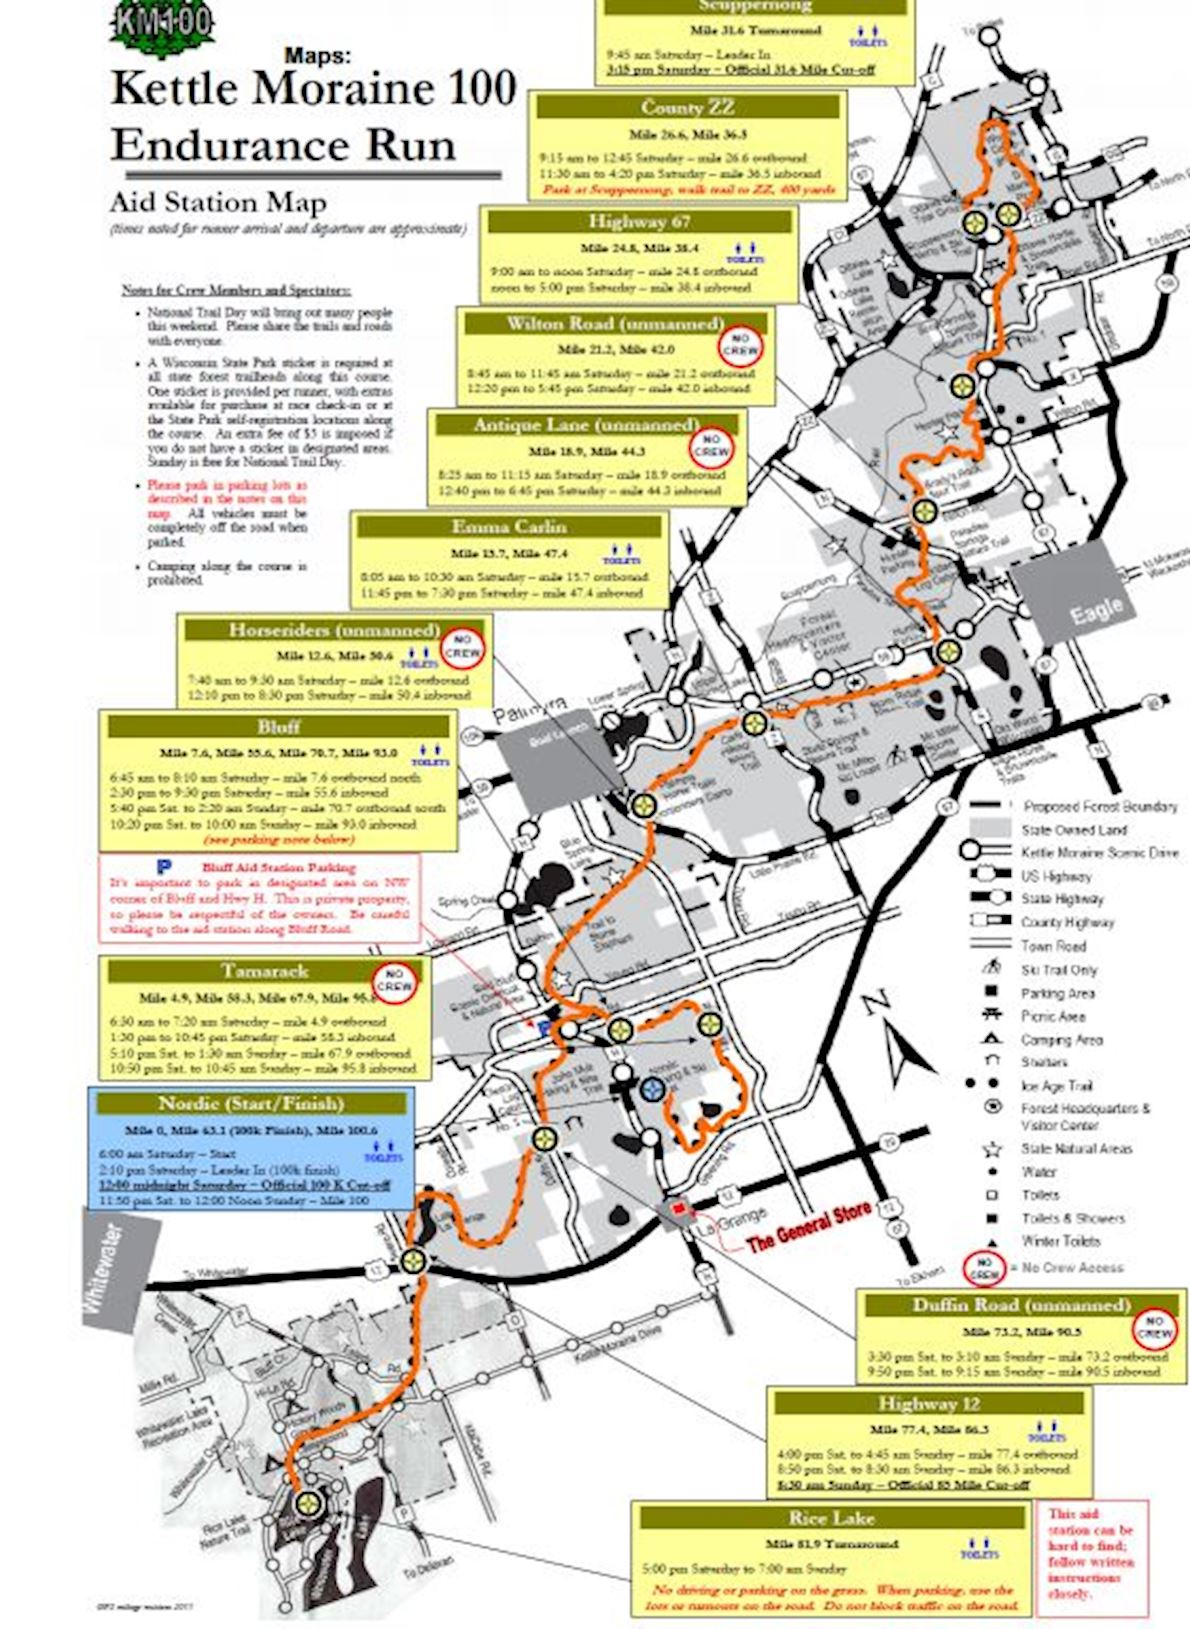 Kettle Moraine 100 Endurance Runs Route Map